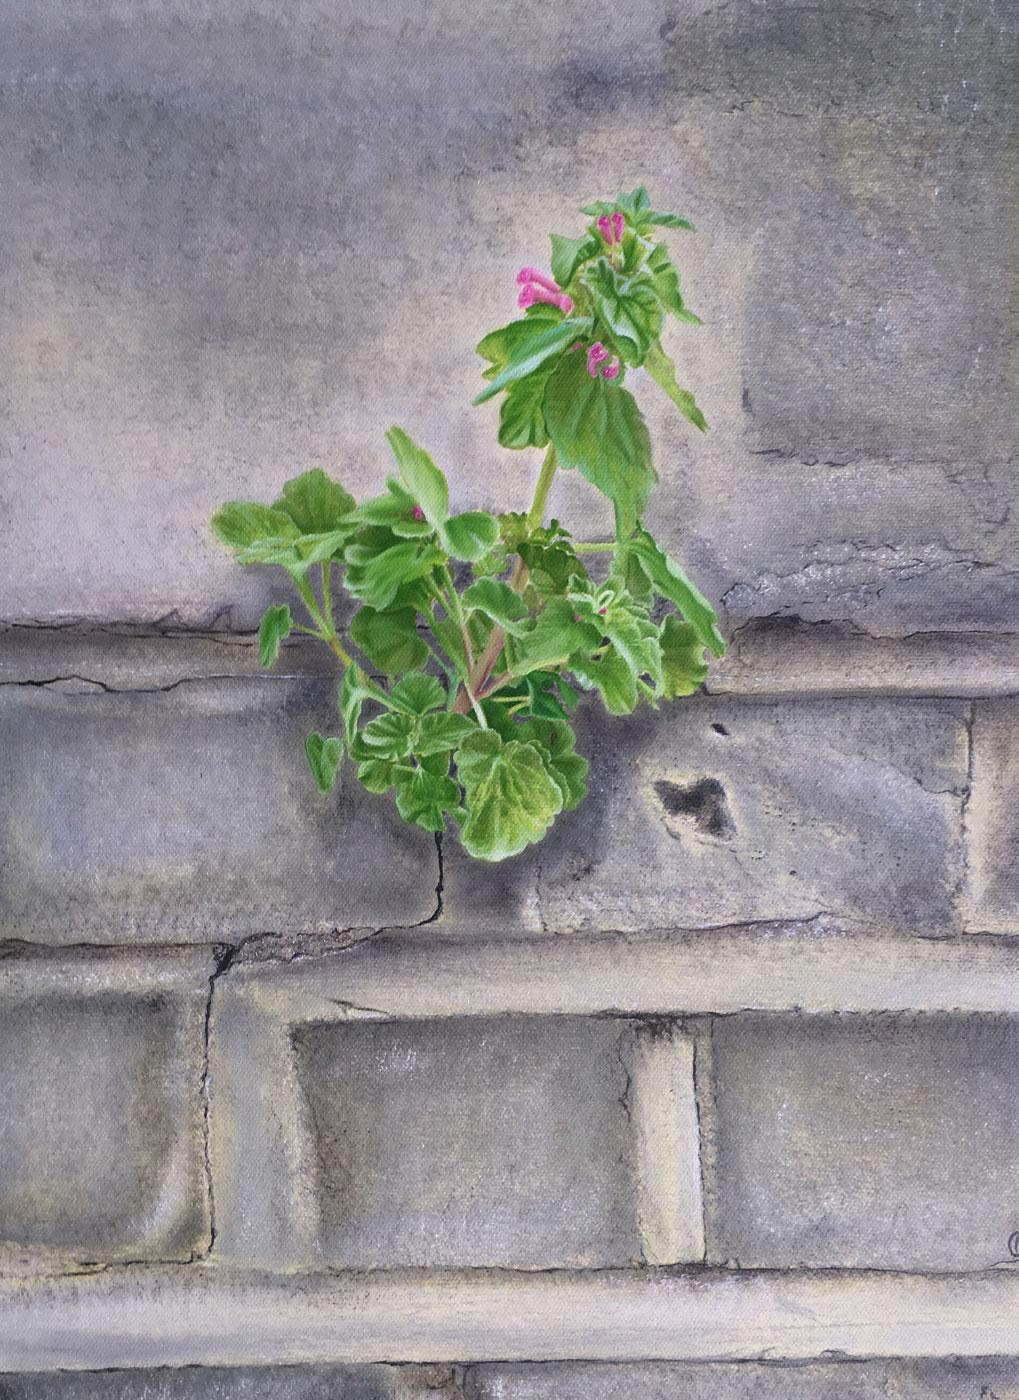 Urban Nature of Wild Pink Flowers